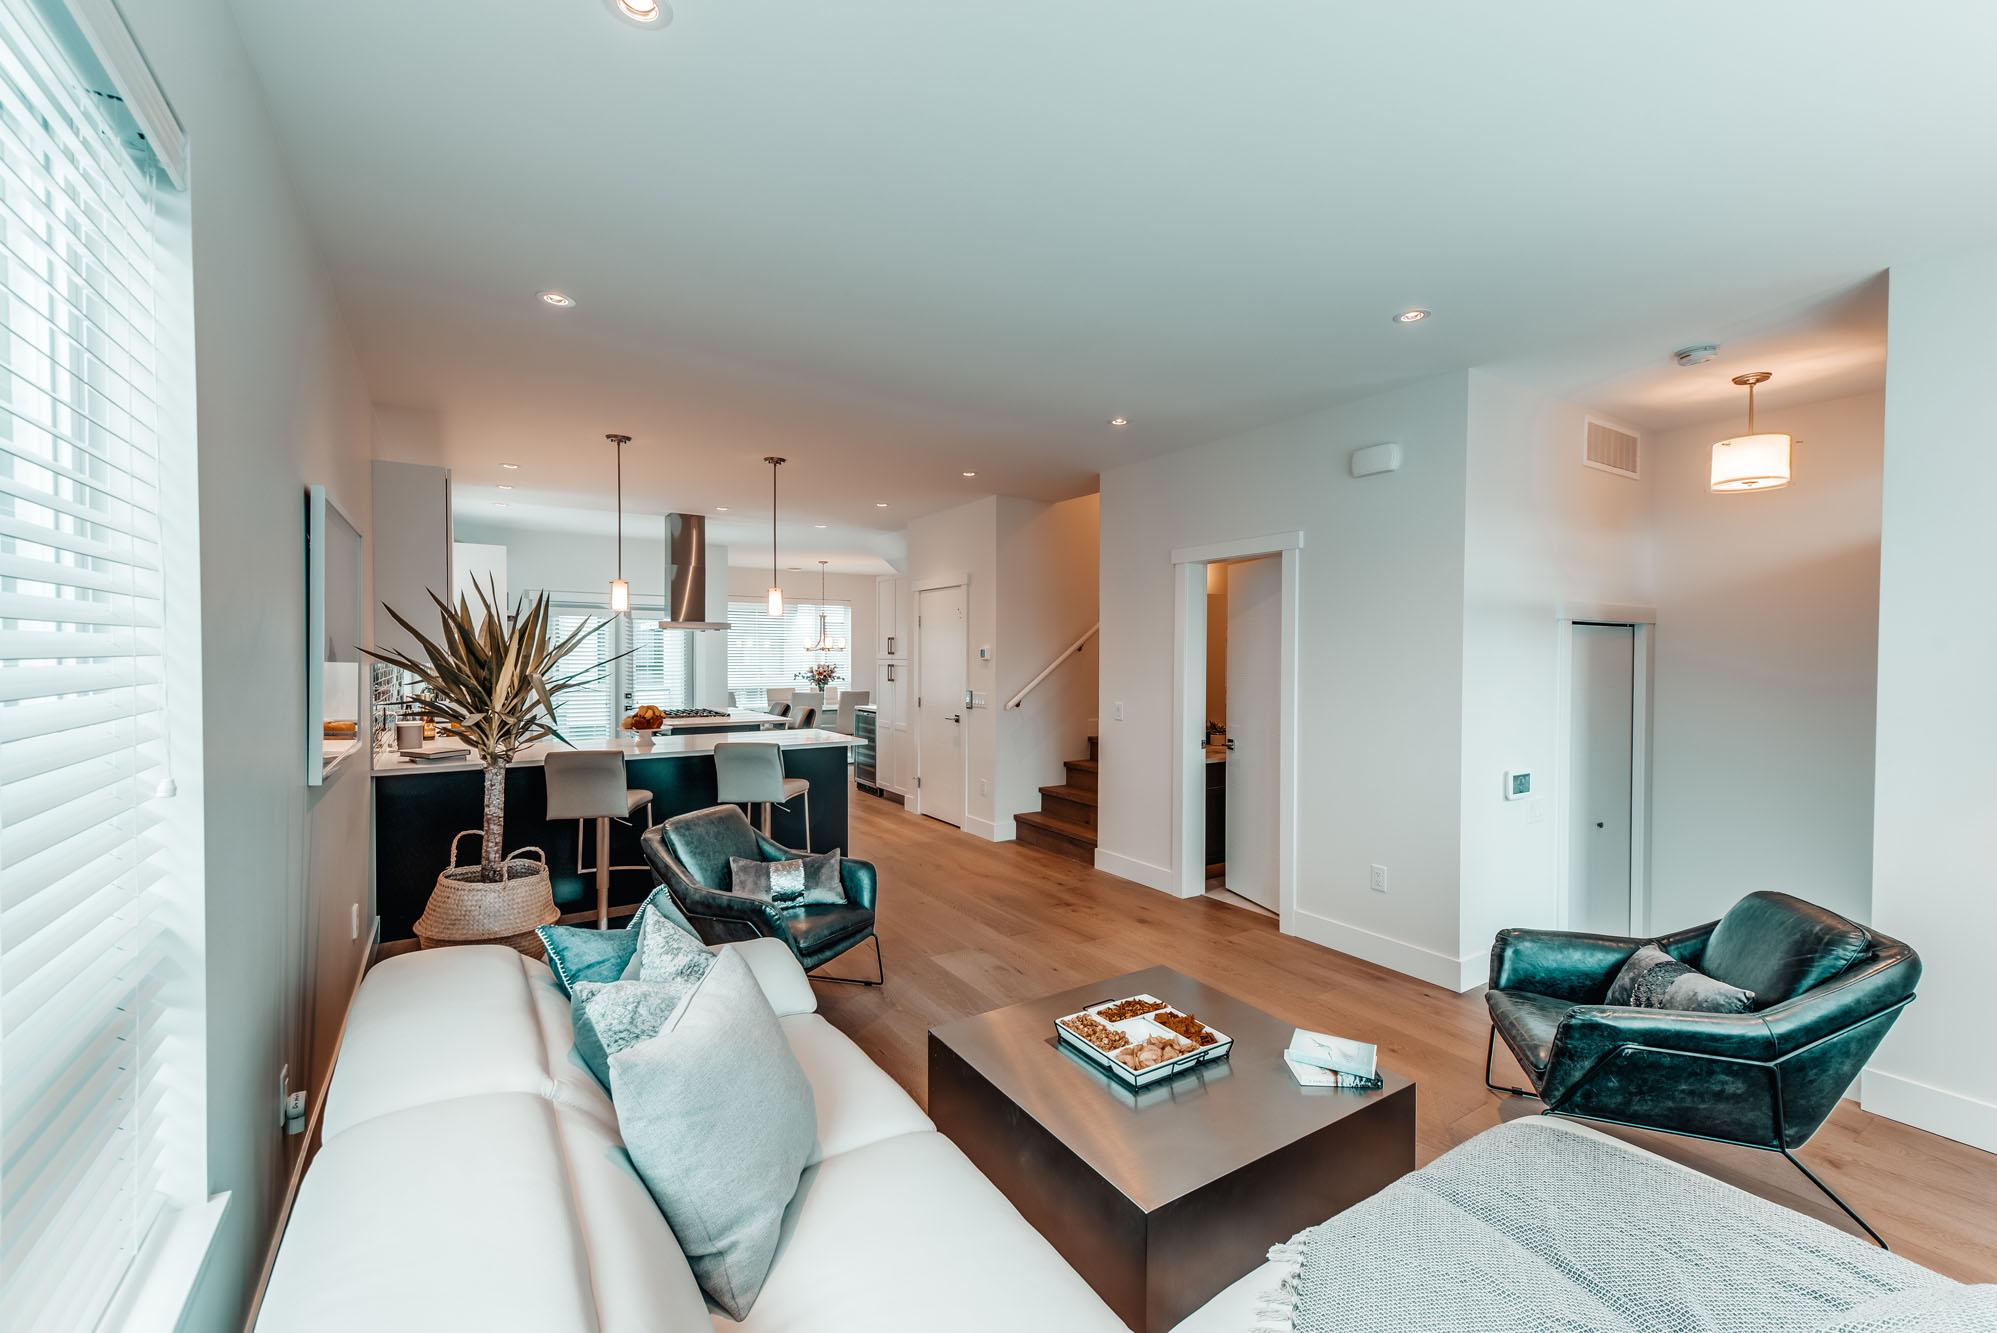 Gyro Beach Townhomes Living Room Interior